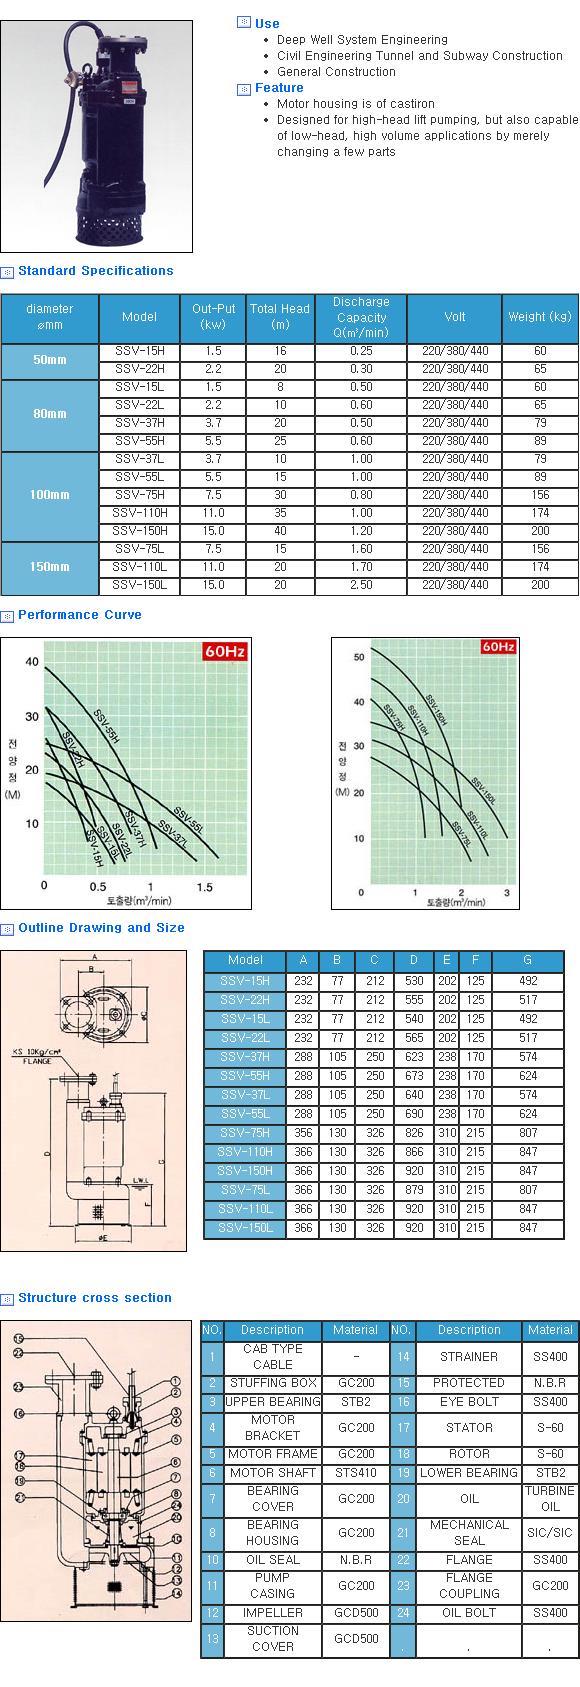 Shinshin Pump Manufacturing Co. Drain Pump for Civil Engineering Site SSV